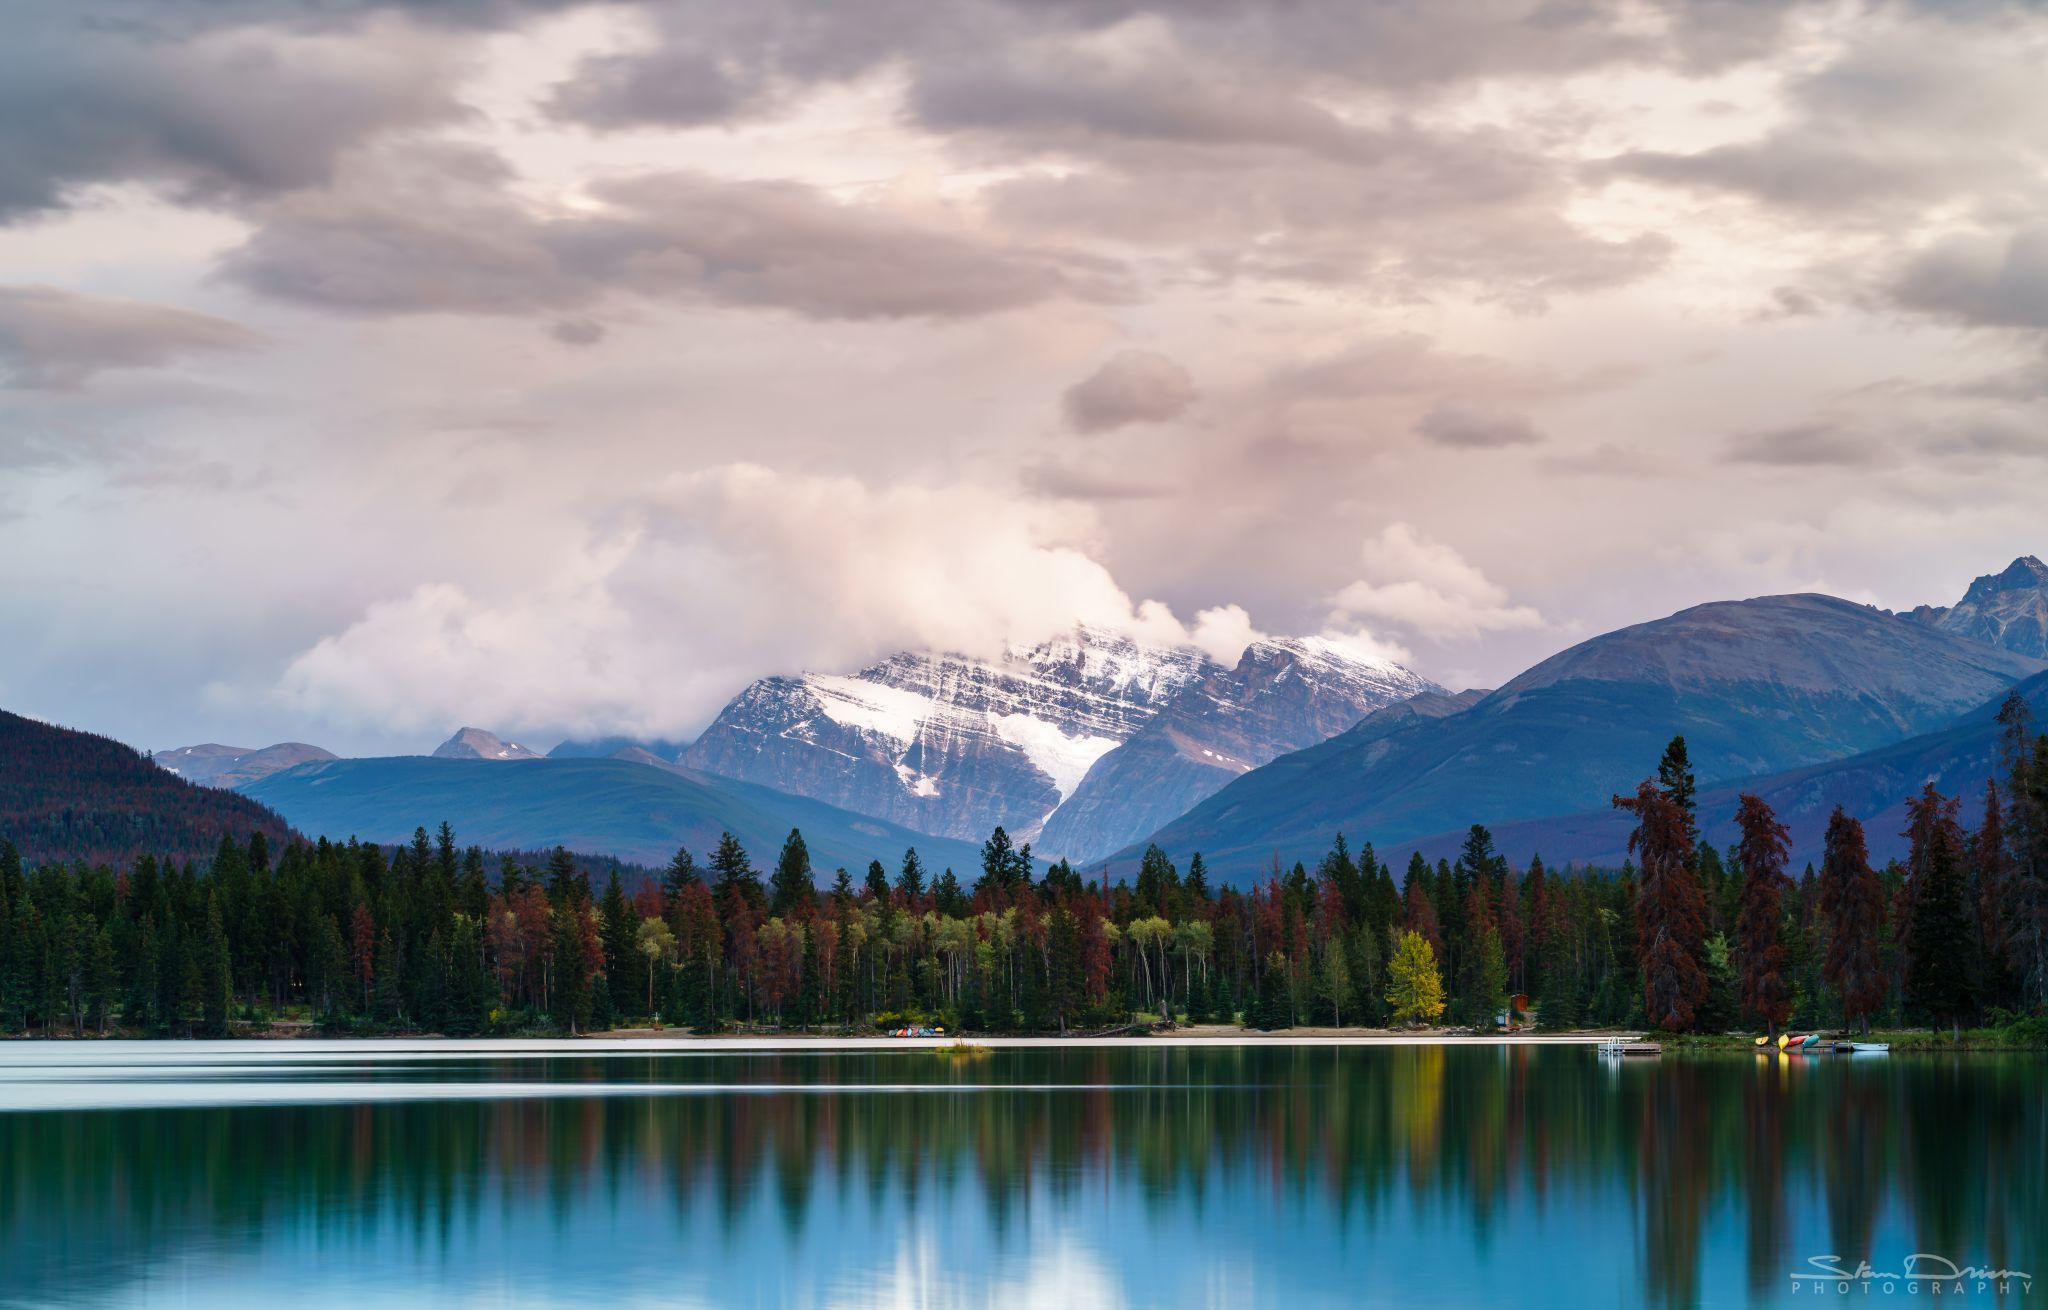 Edith Lake, Canada